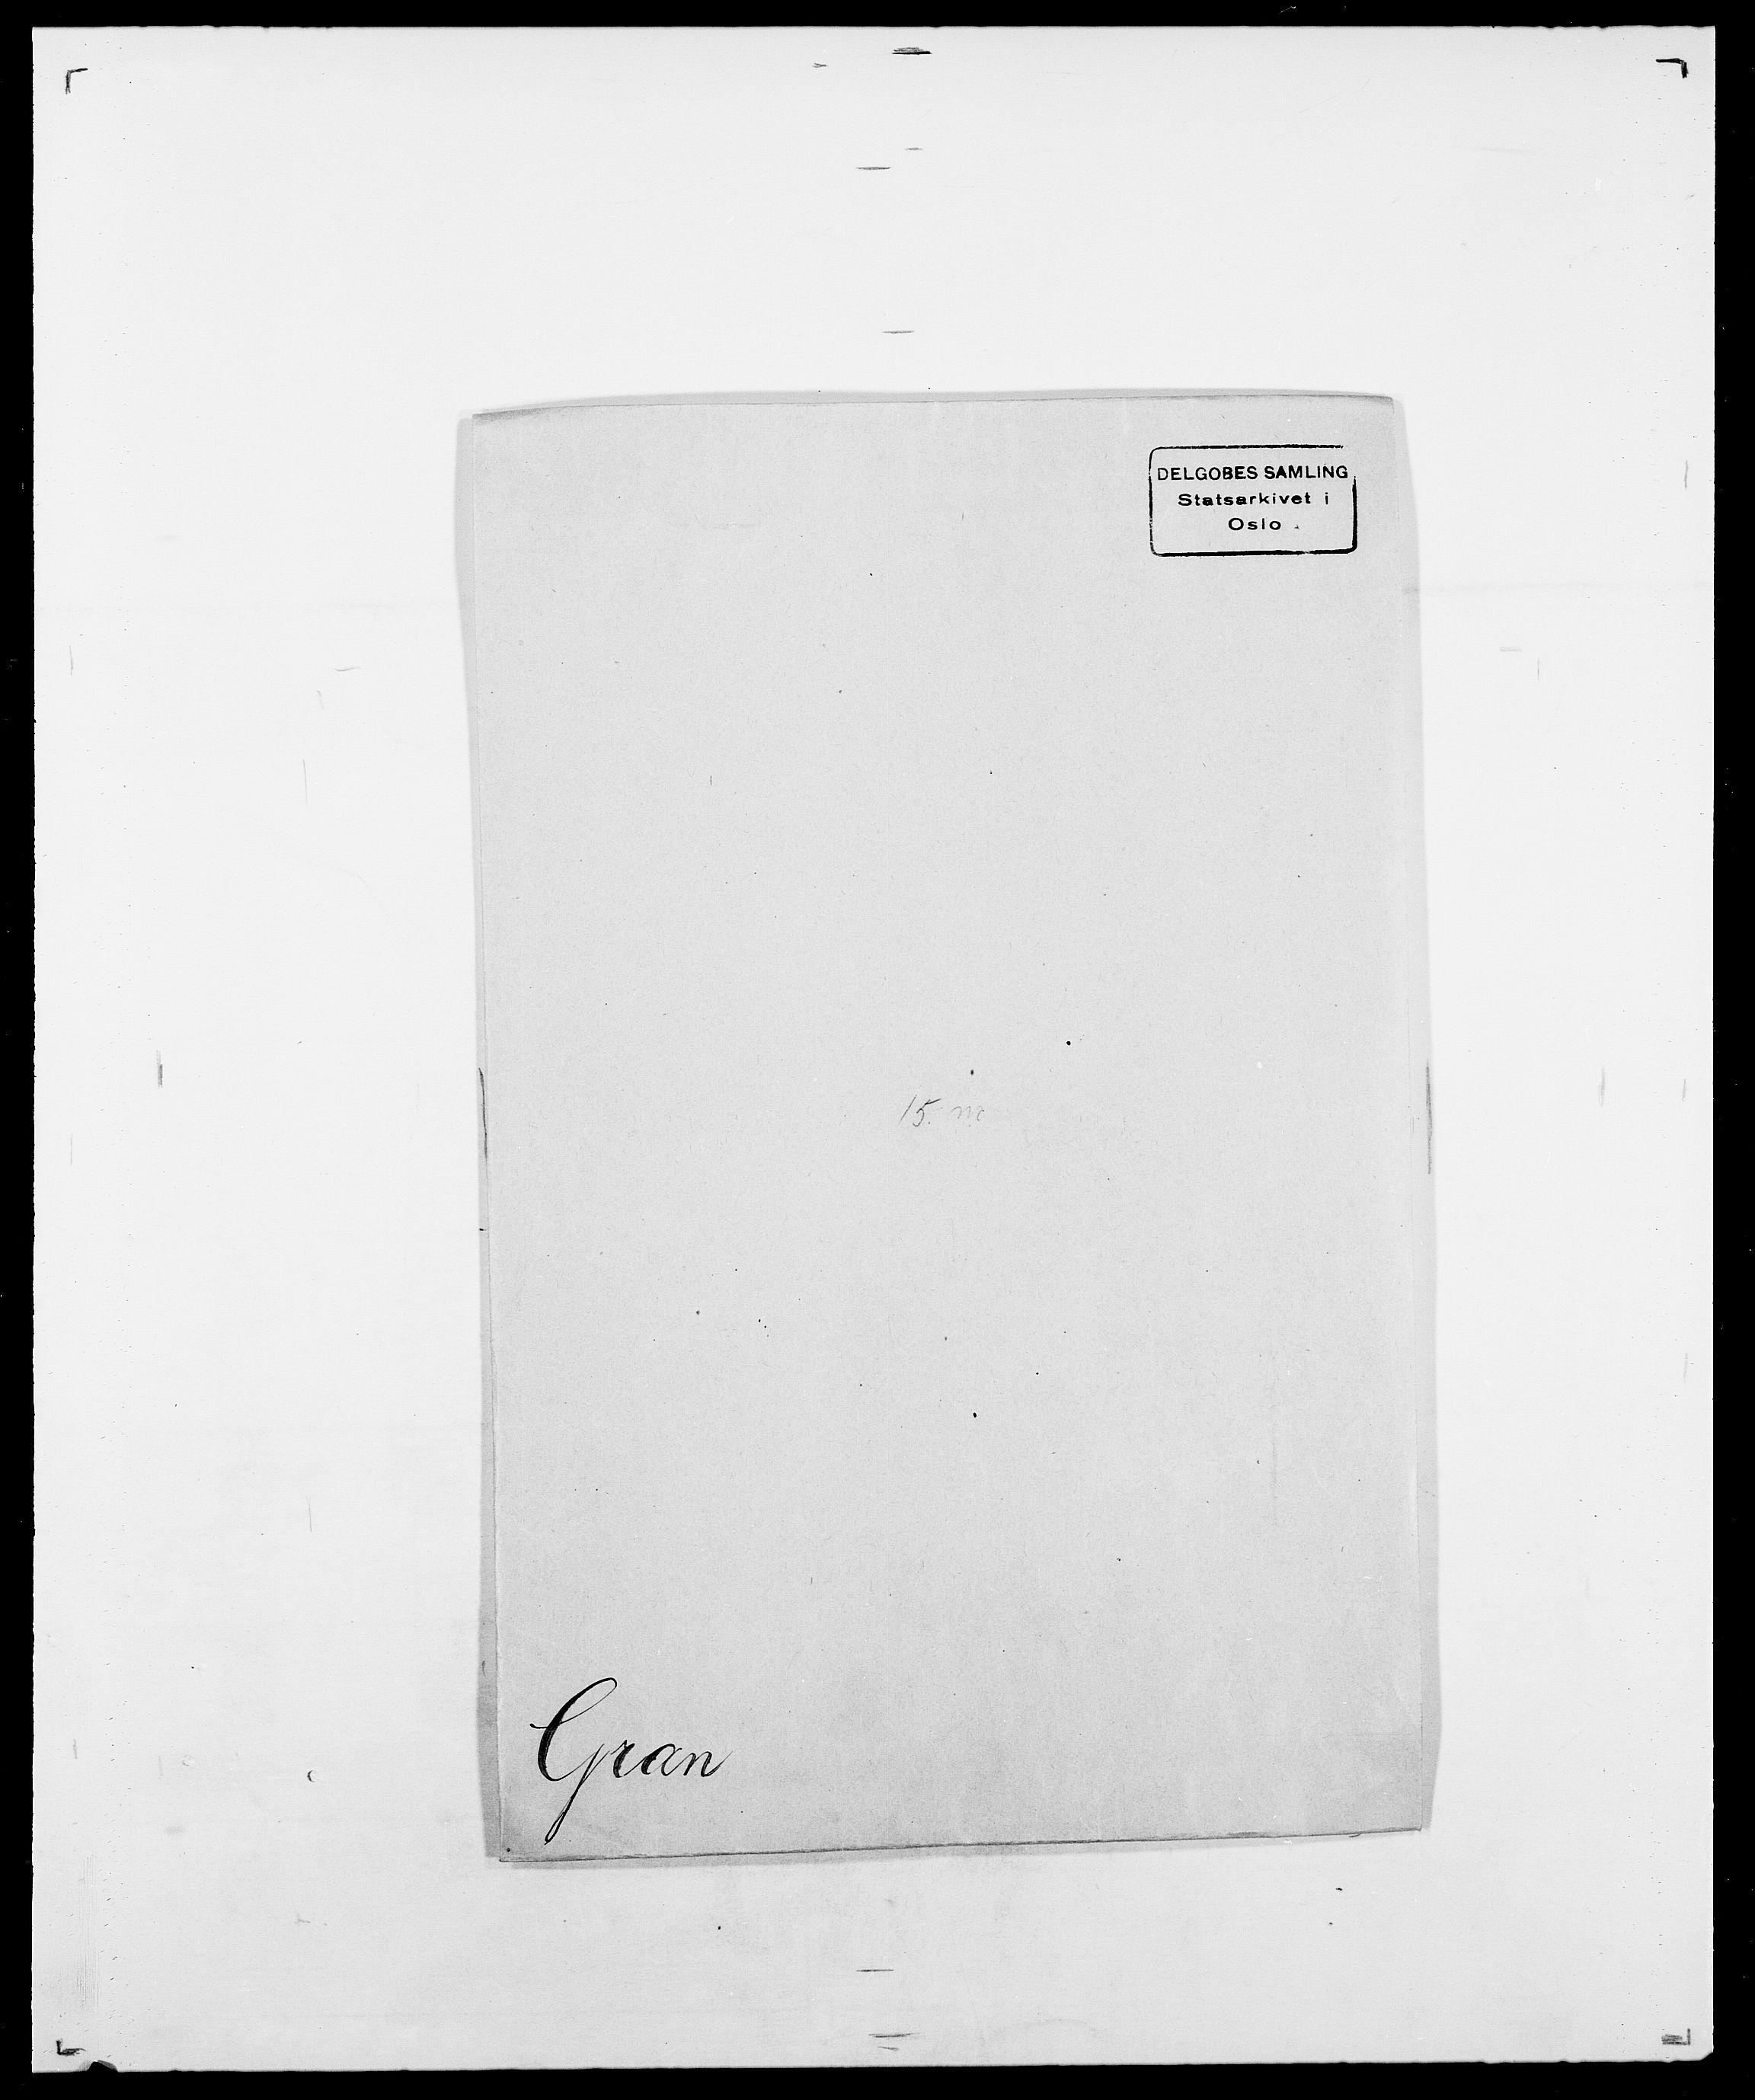 SAO, Delgobe, Charles Antoine - samling, D/Da/L0014: Giebdhausen - Grip, s. 522